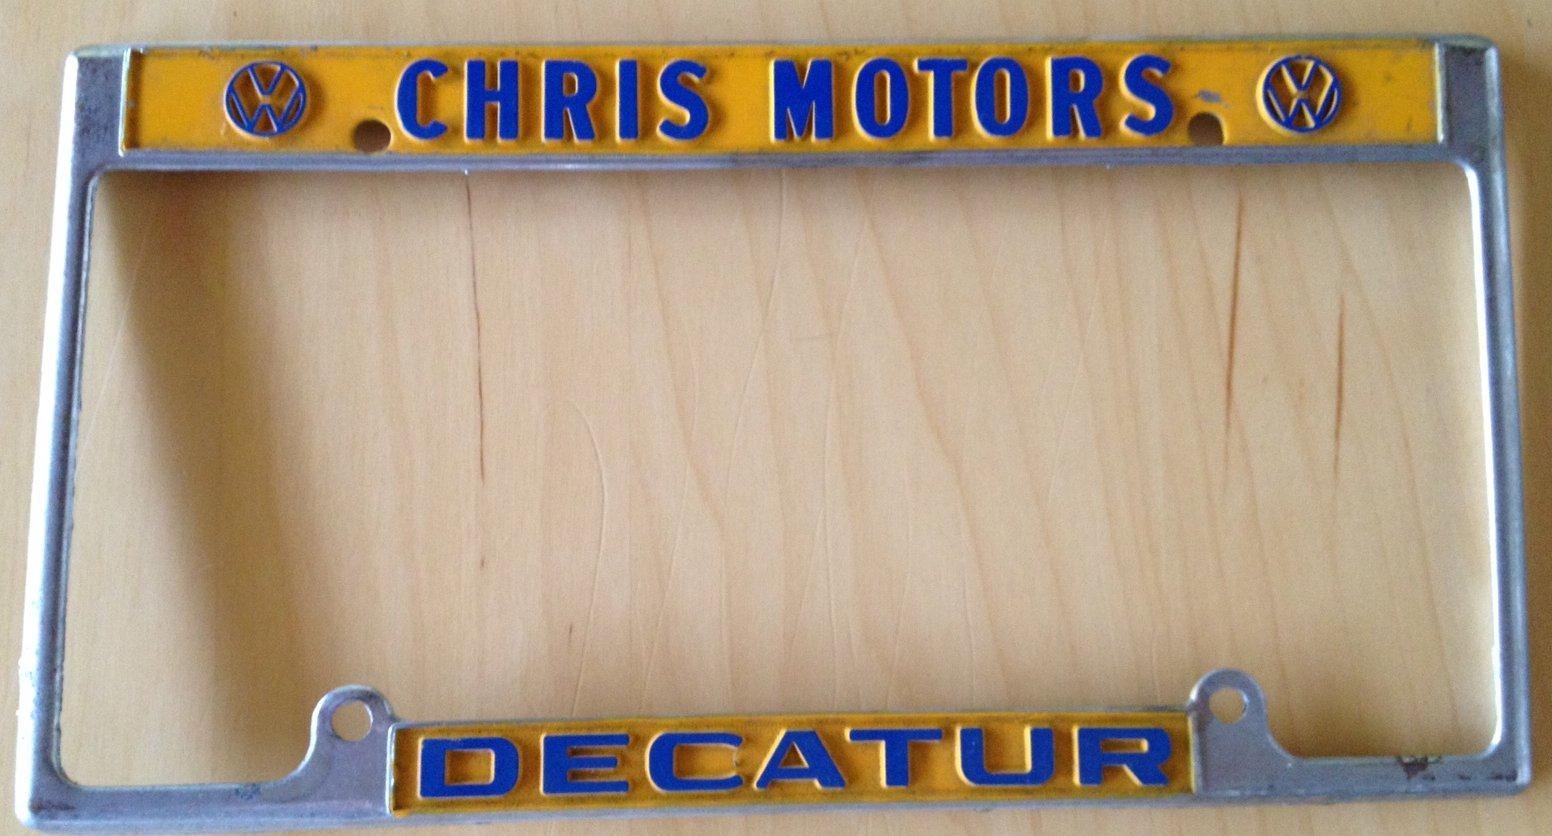 Thesamba Com Chris Motors Corp Decatur Georgia